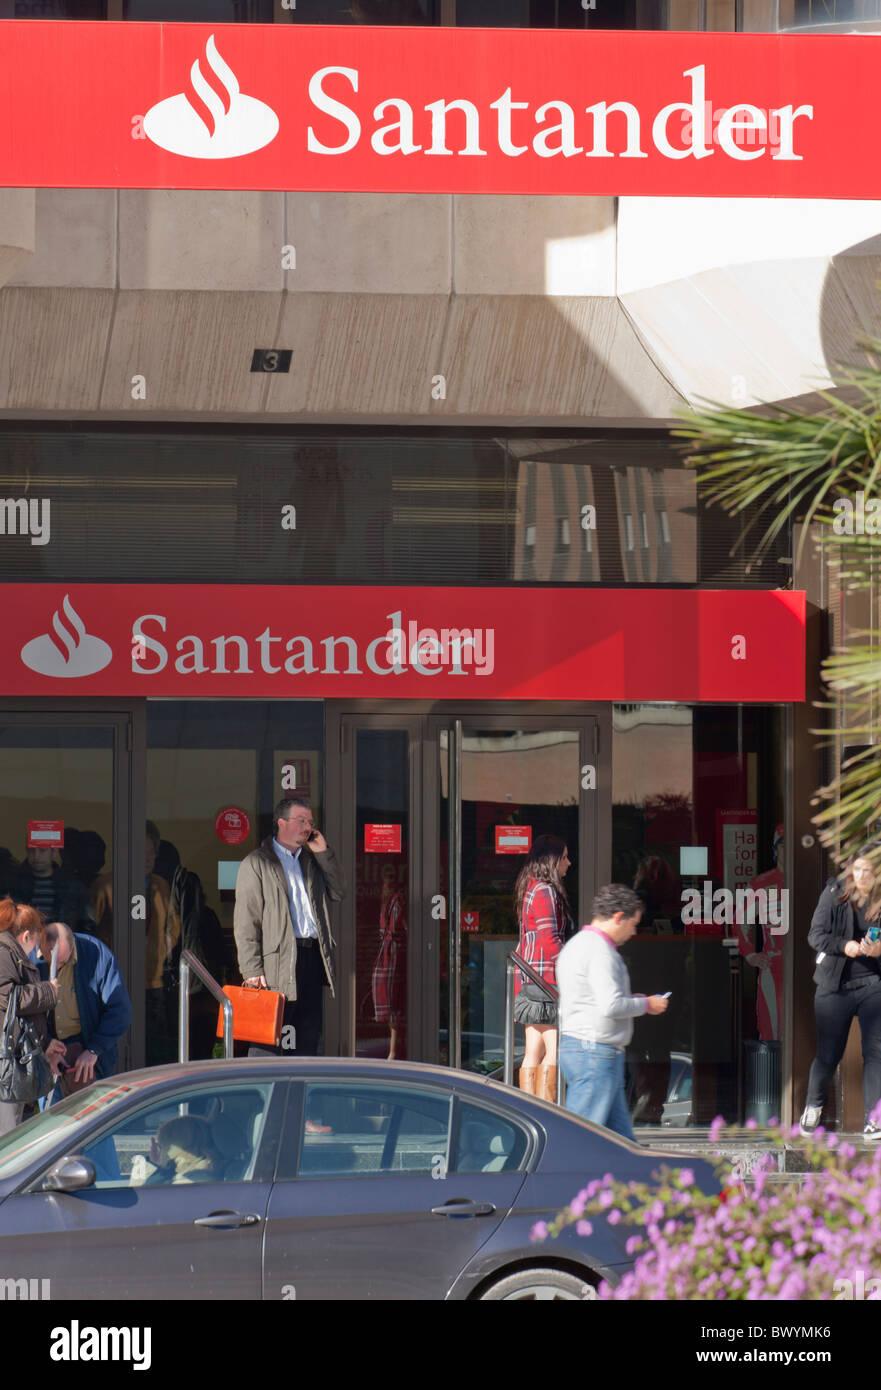 Branch of Santander bank in Malaga, Spain. - Stock Image